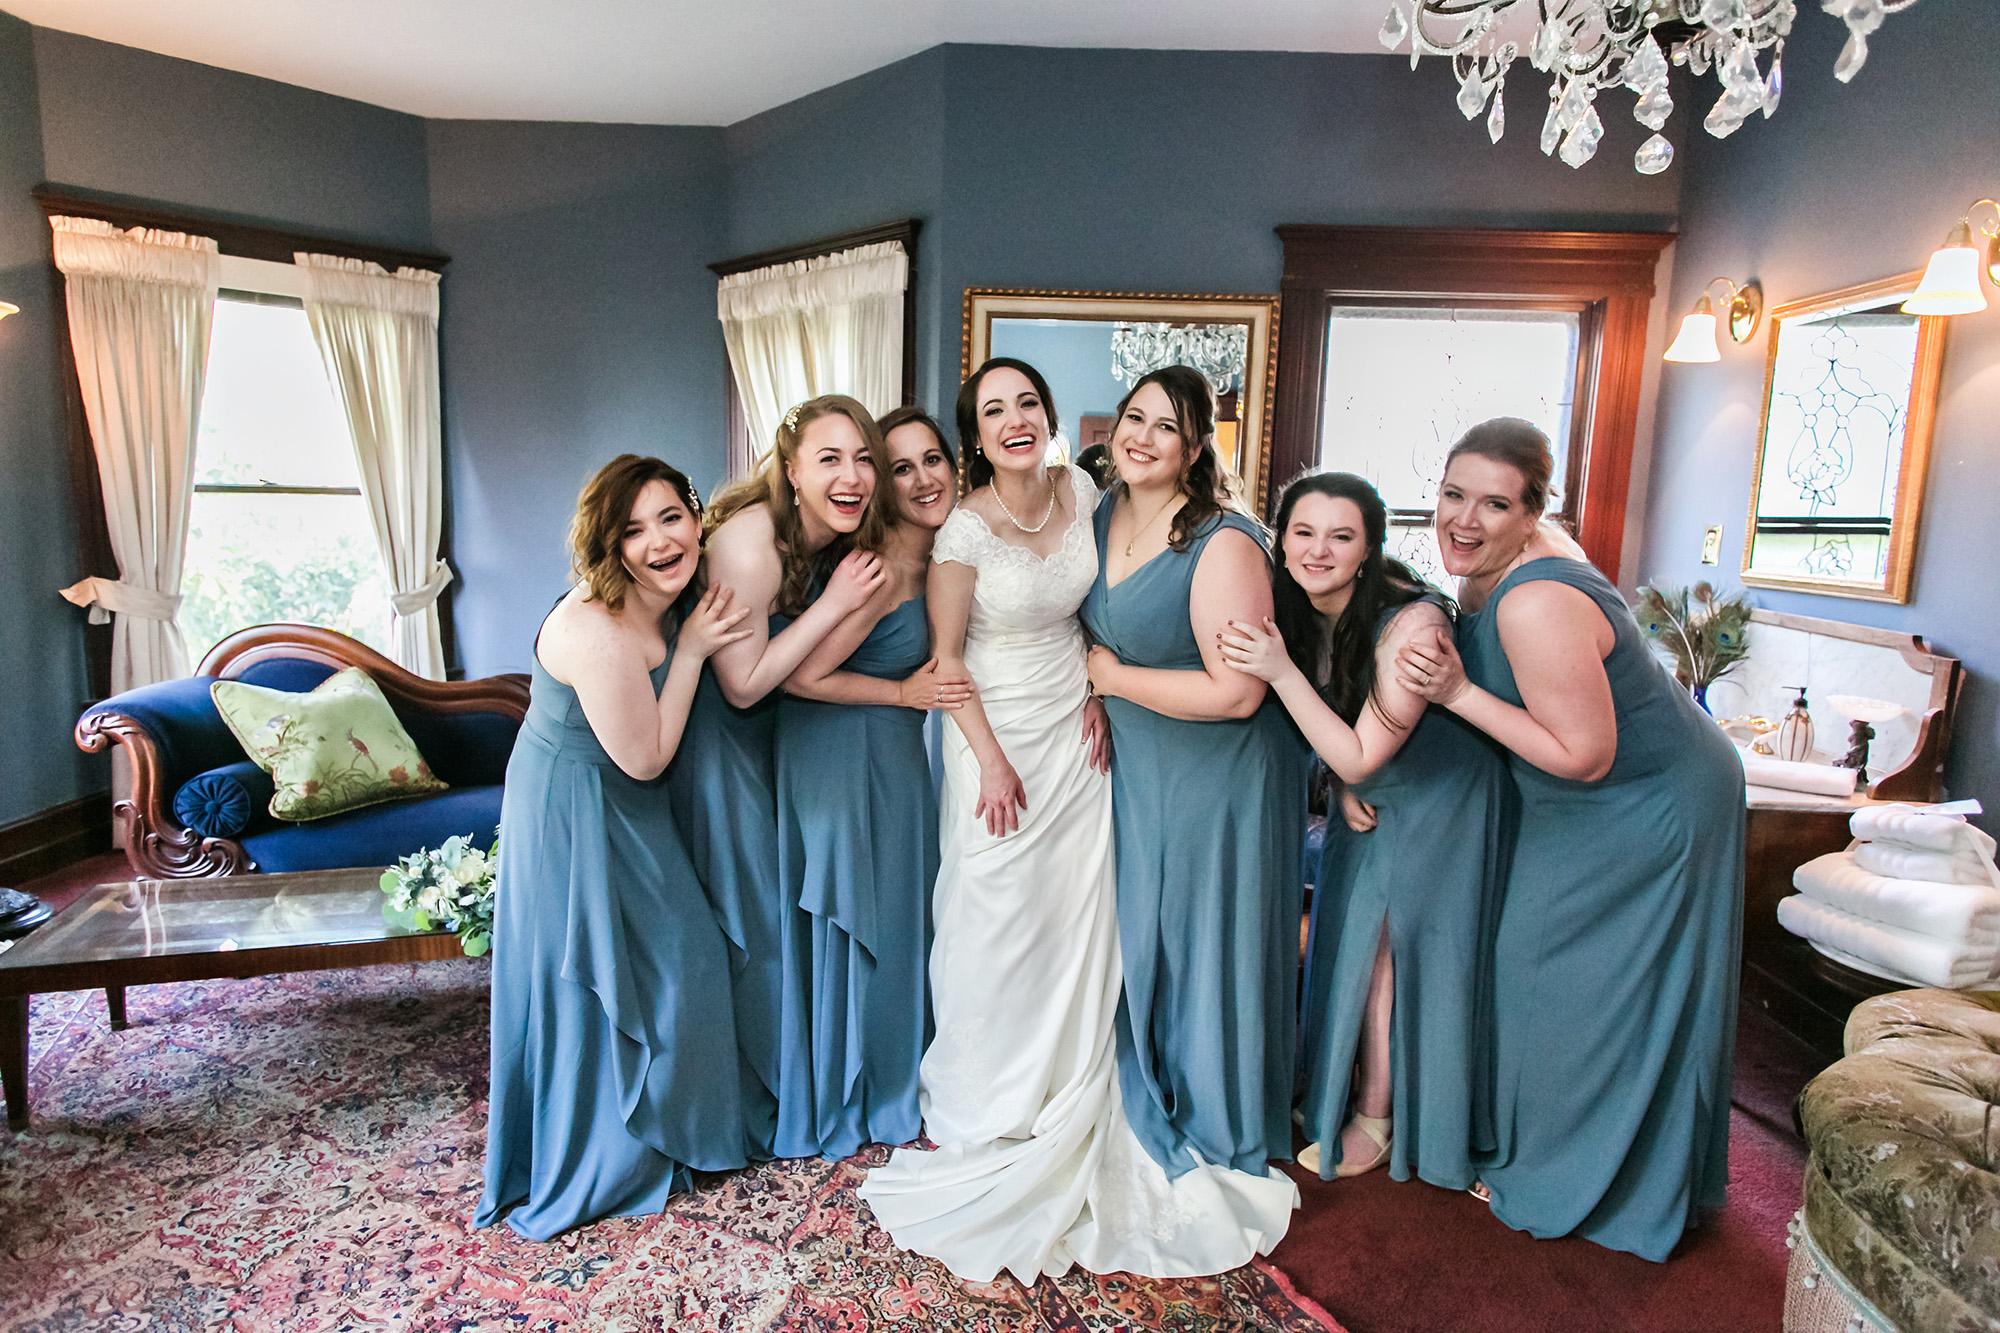 associate-photographer-christmas-house-wedding-carrie-vines-0011.jpg